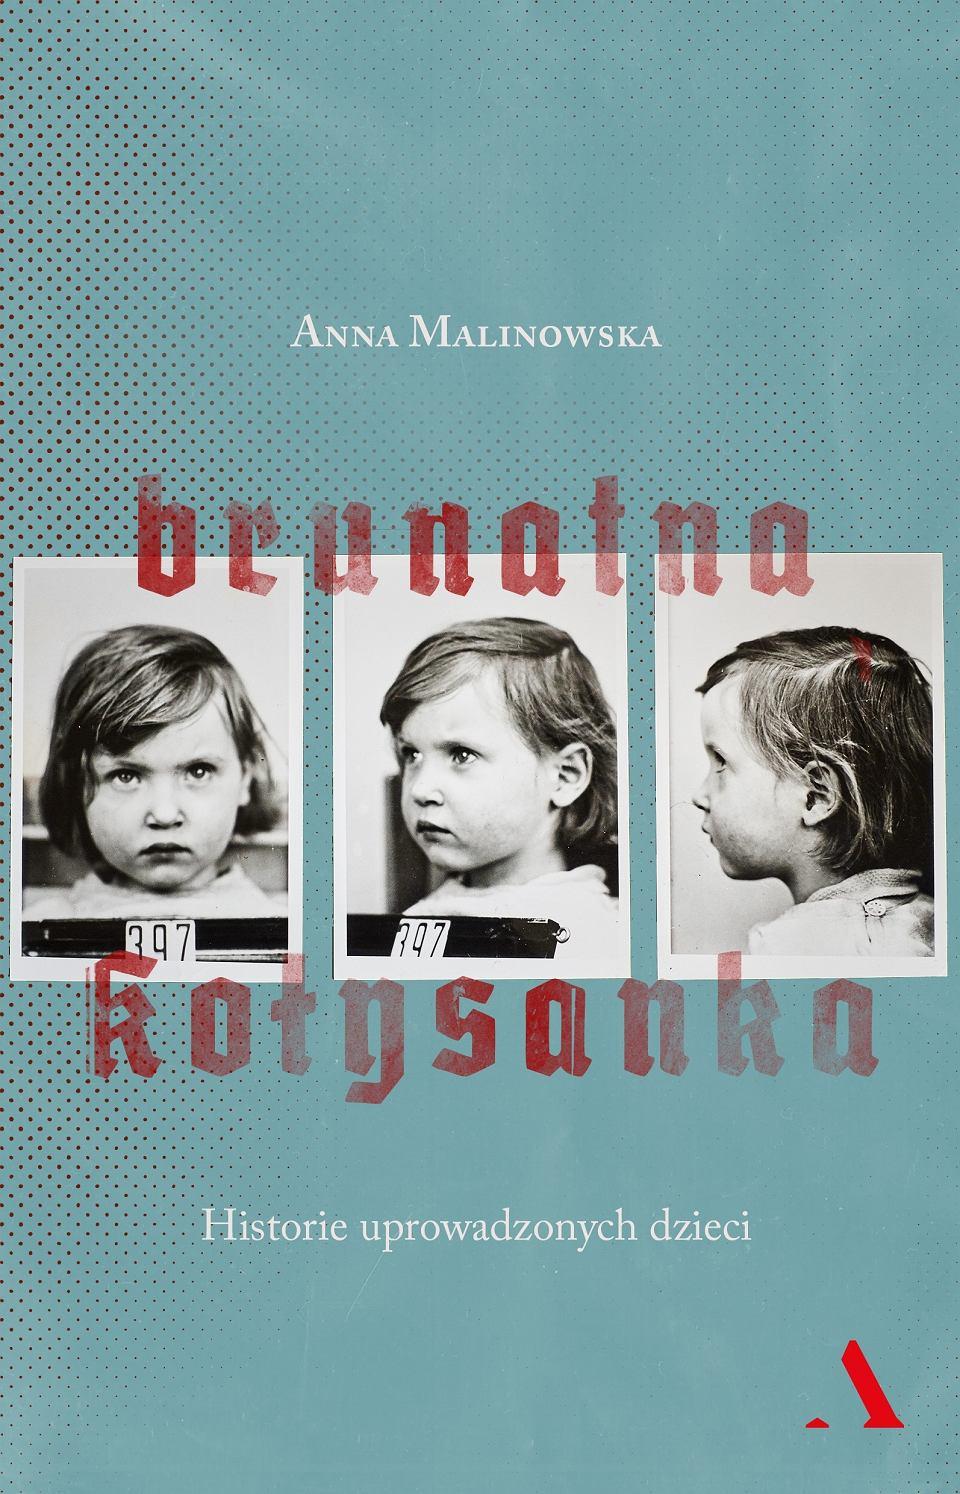 chidusz-brunatna-kolysanka-anna-malinowska-agora-historie-uprowadzonych-dzieci